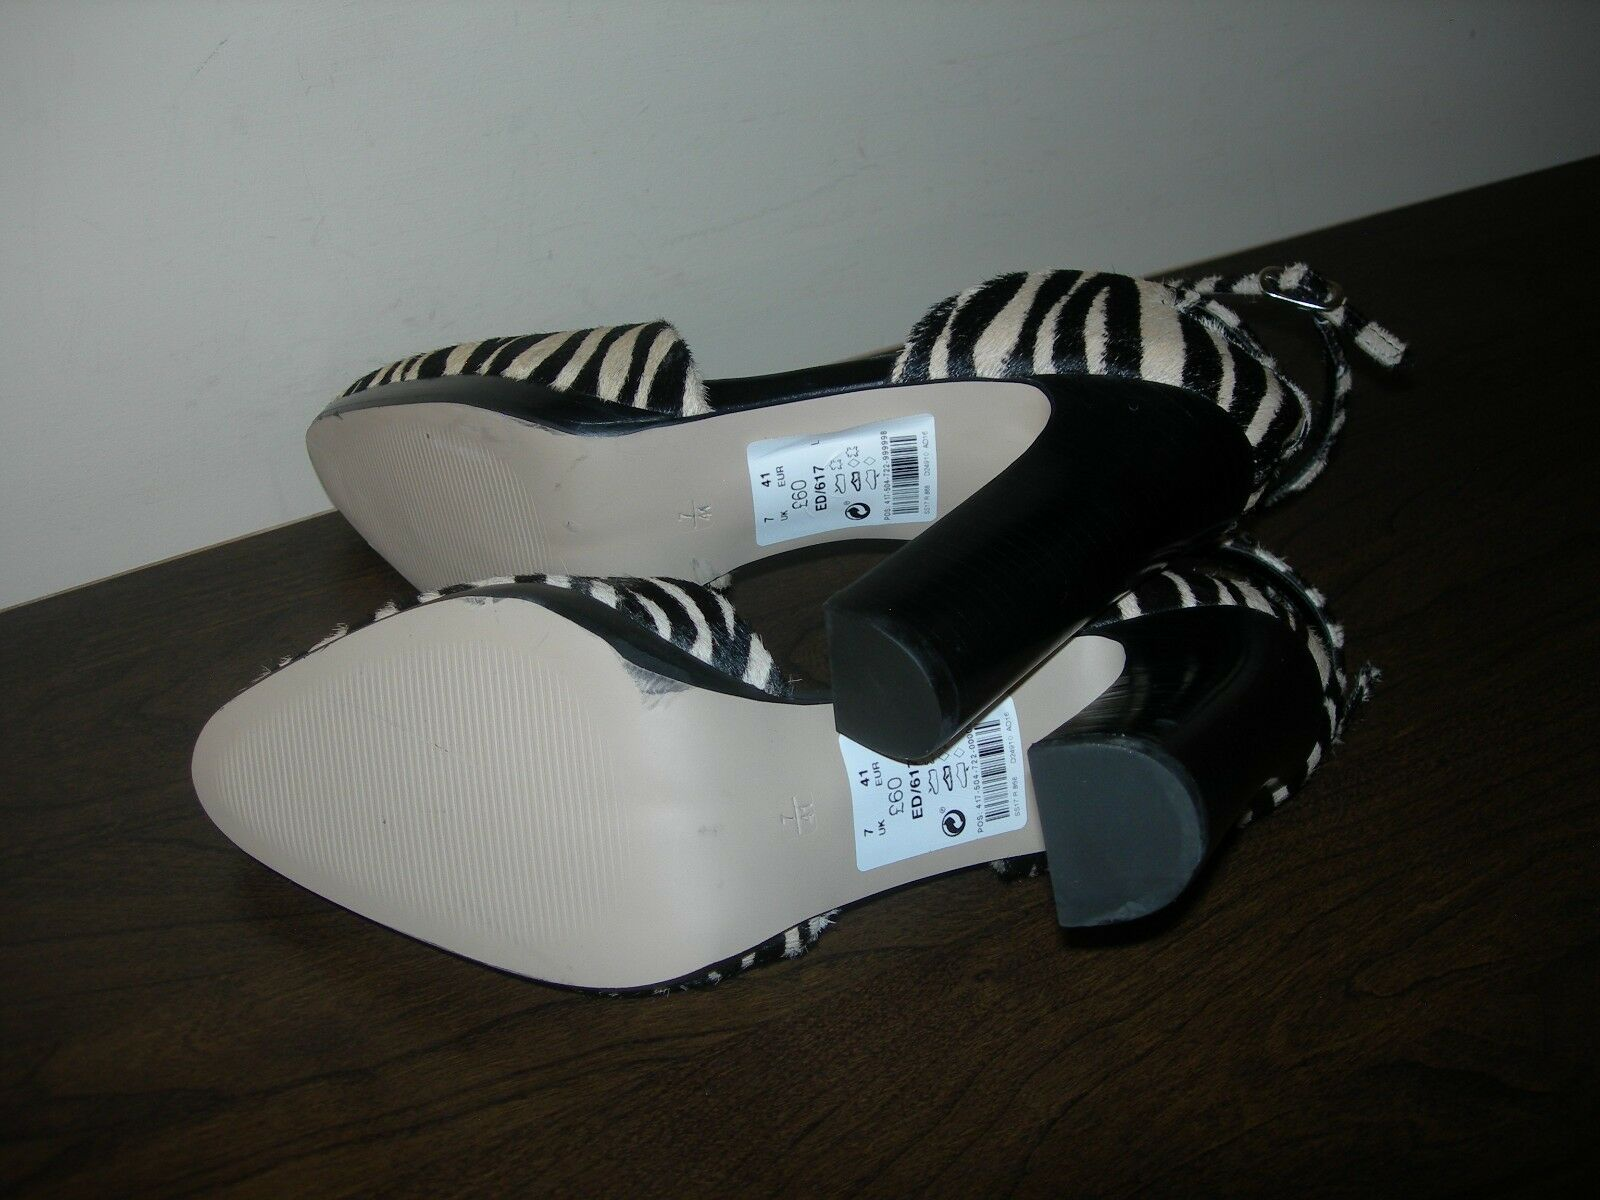 NEXT SIGNATURE WOMEN'S COURT Schuhe HEELS EU ANIMAL PRINT PONY HAIR EU HEELS 41 / UK 7 c0eaa6